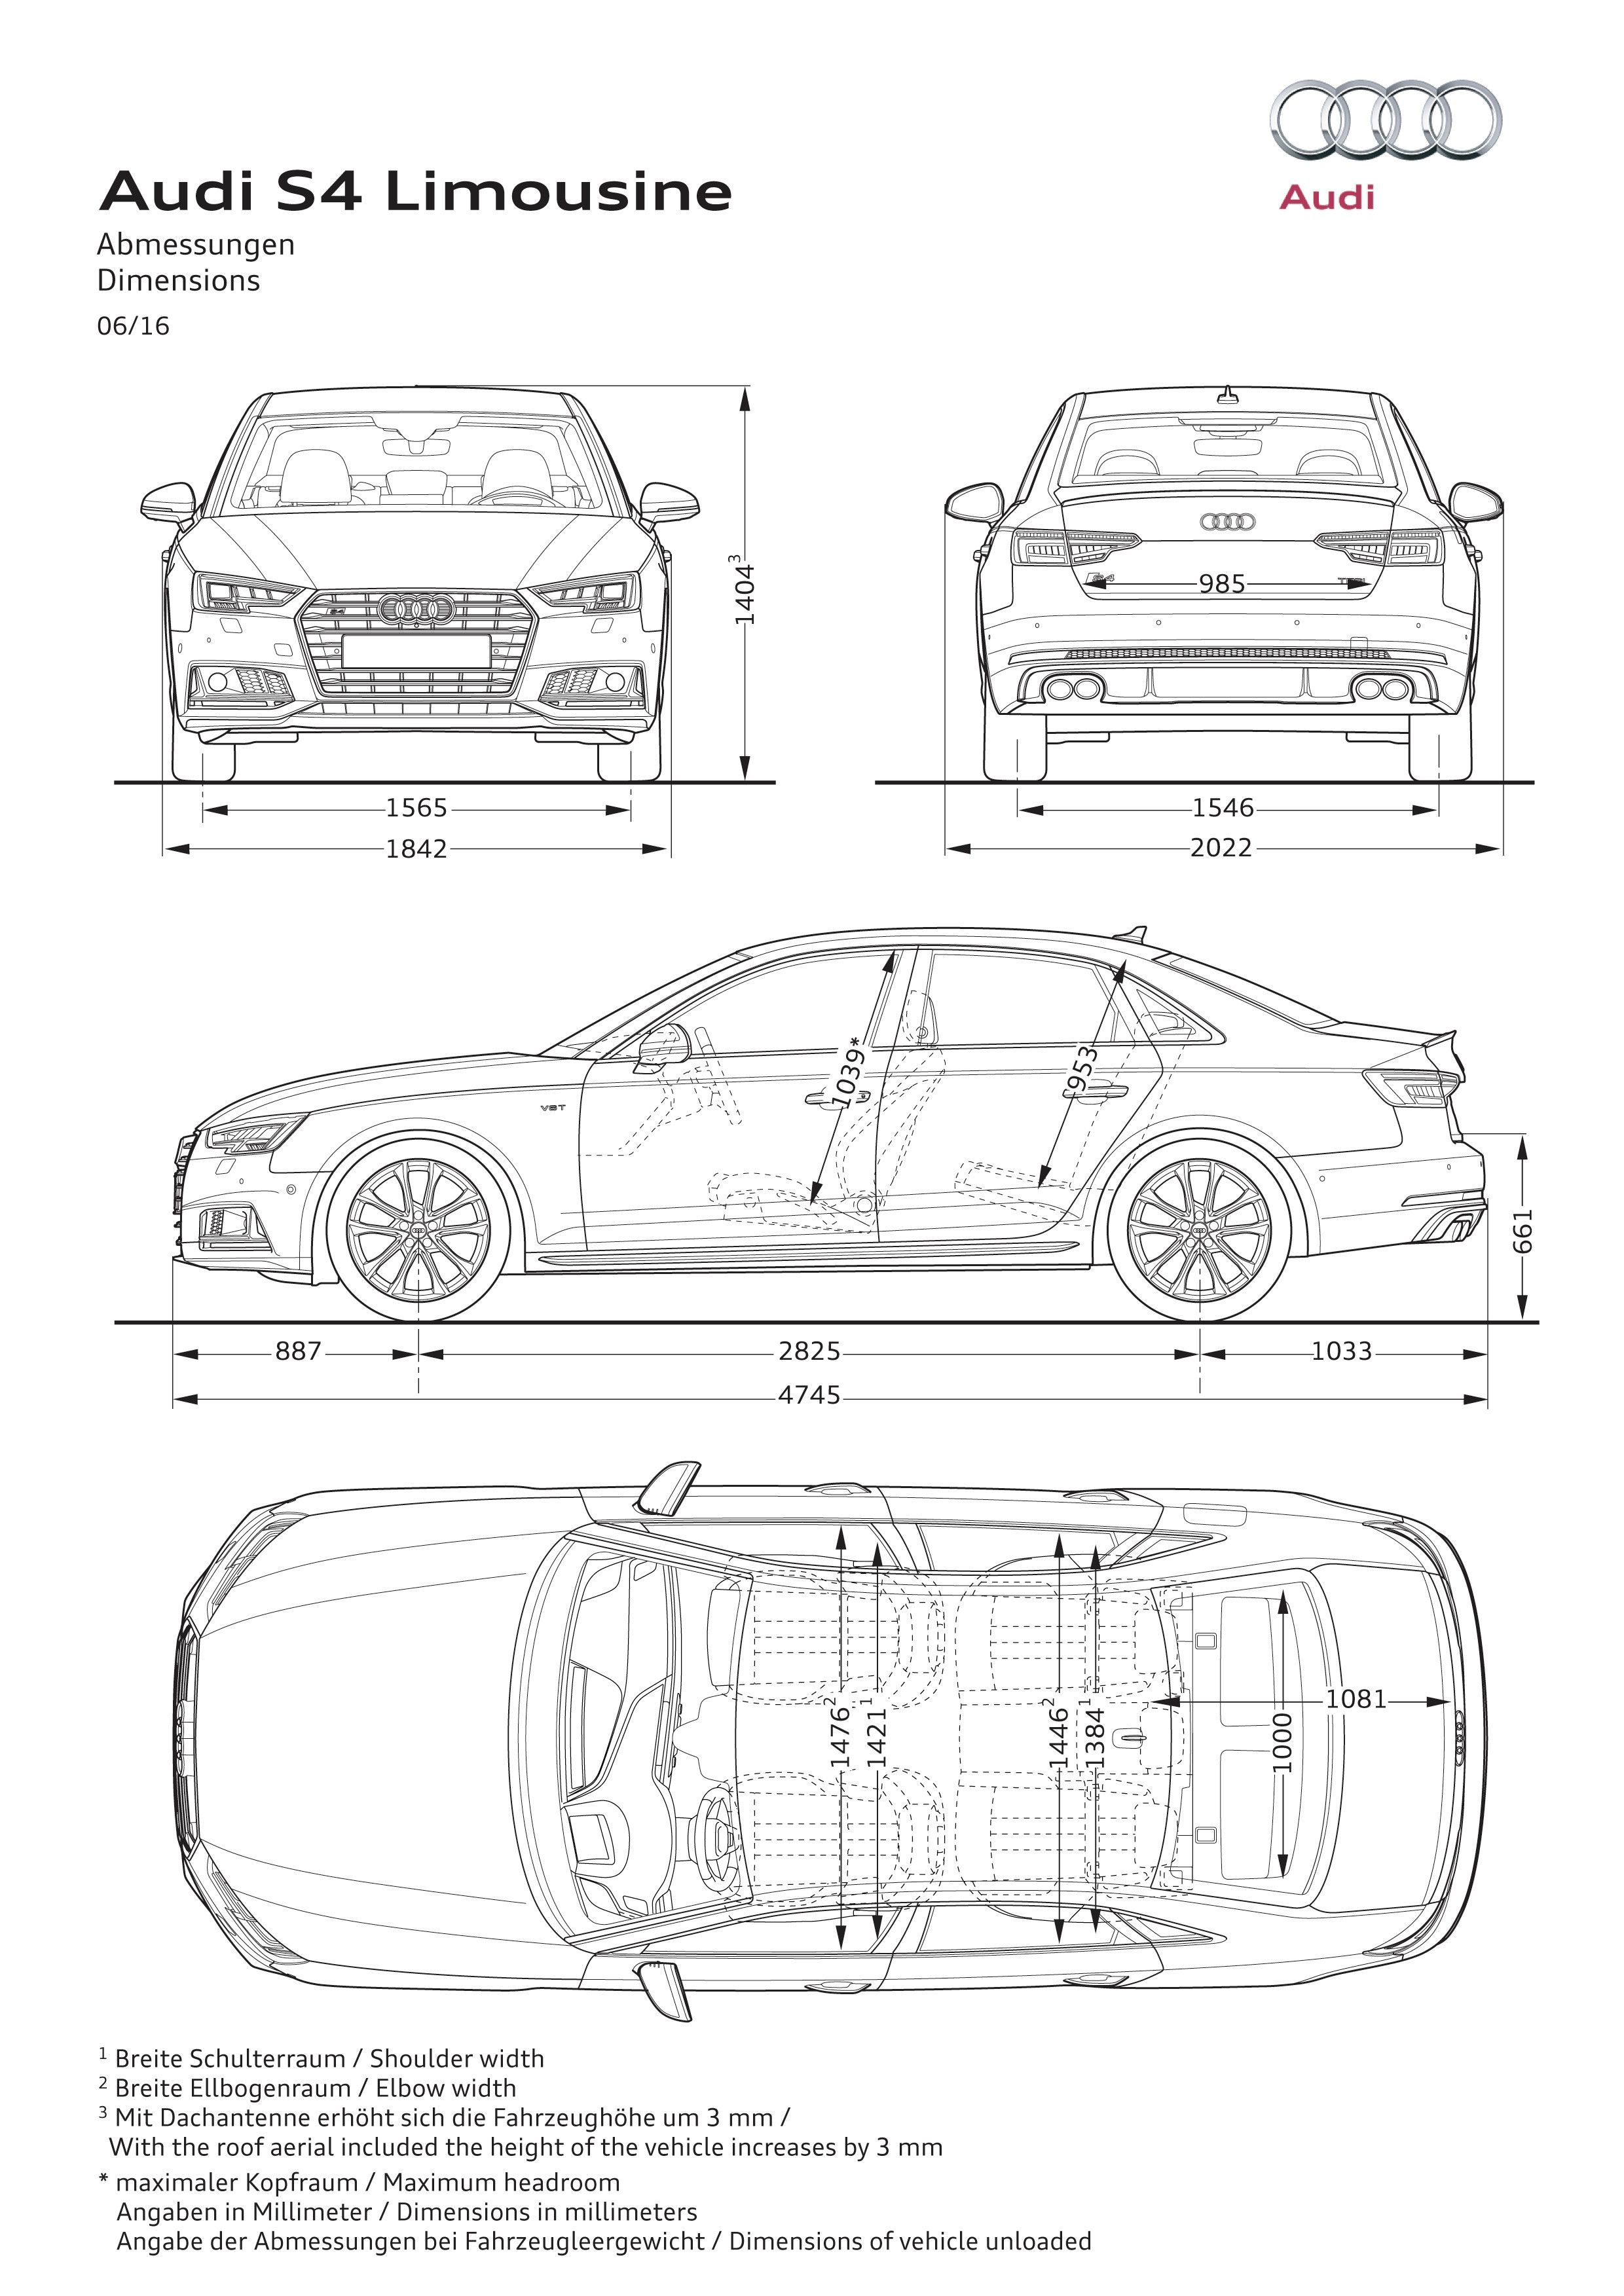 2017 Audi S4 Audi A1 Audi Tt Audi